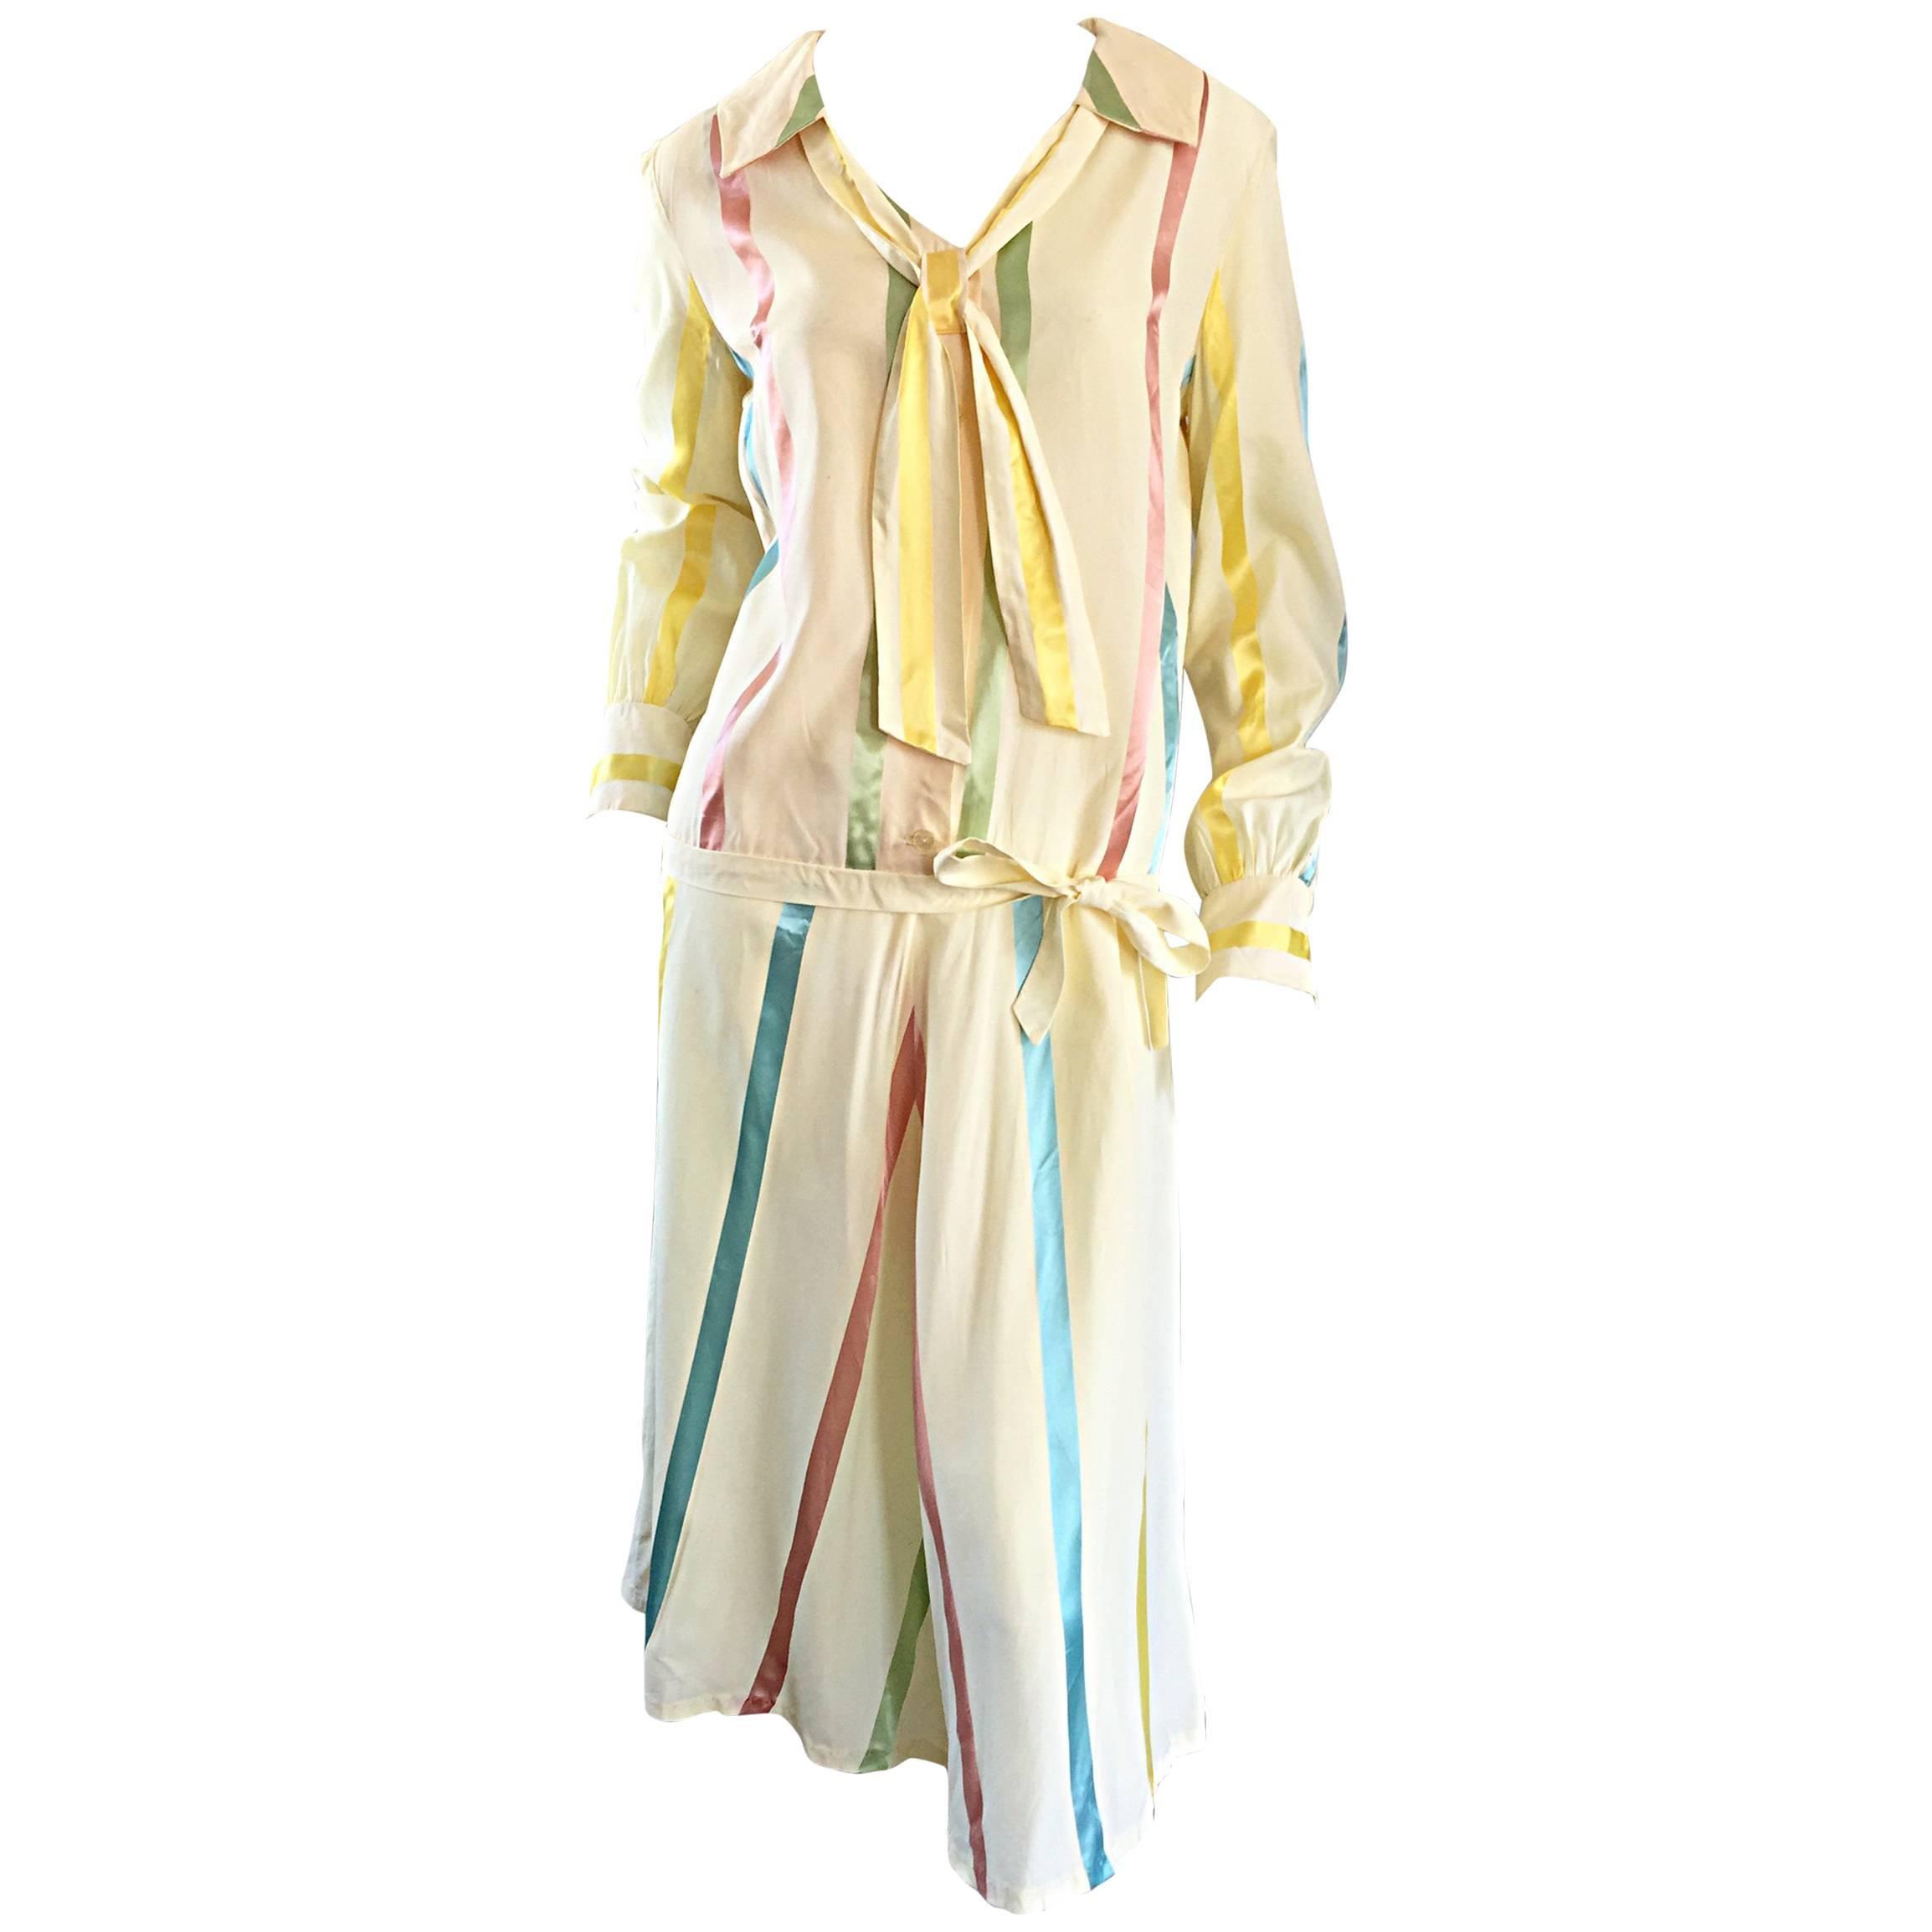 Chic 1920s Ivory ' Candy Stripe ' Silk Drop Waist Vintage 20s Day Dress